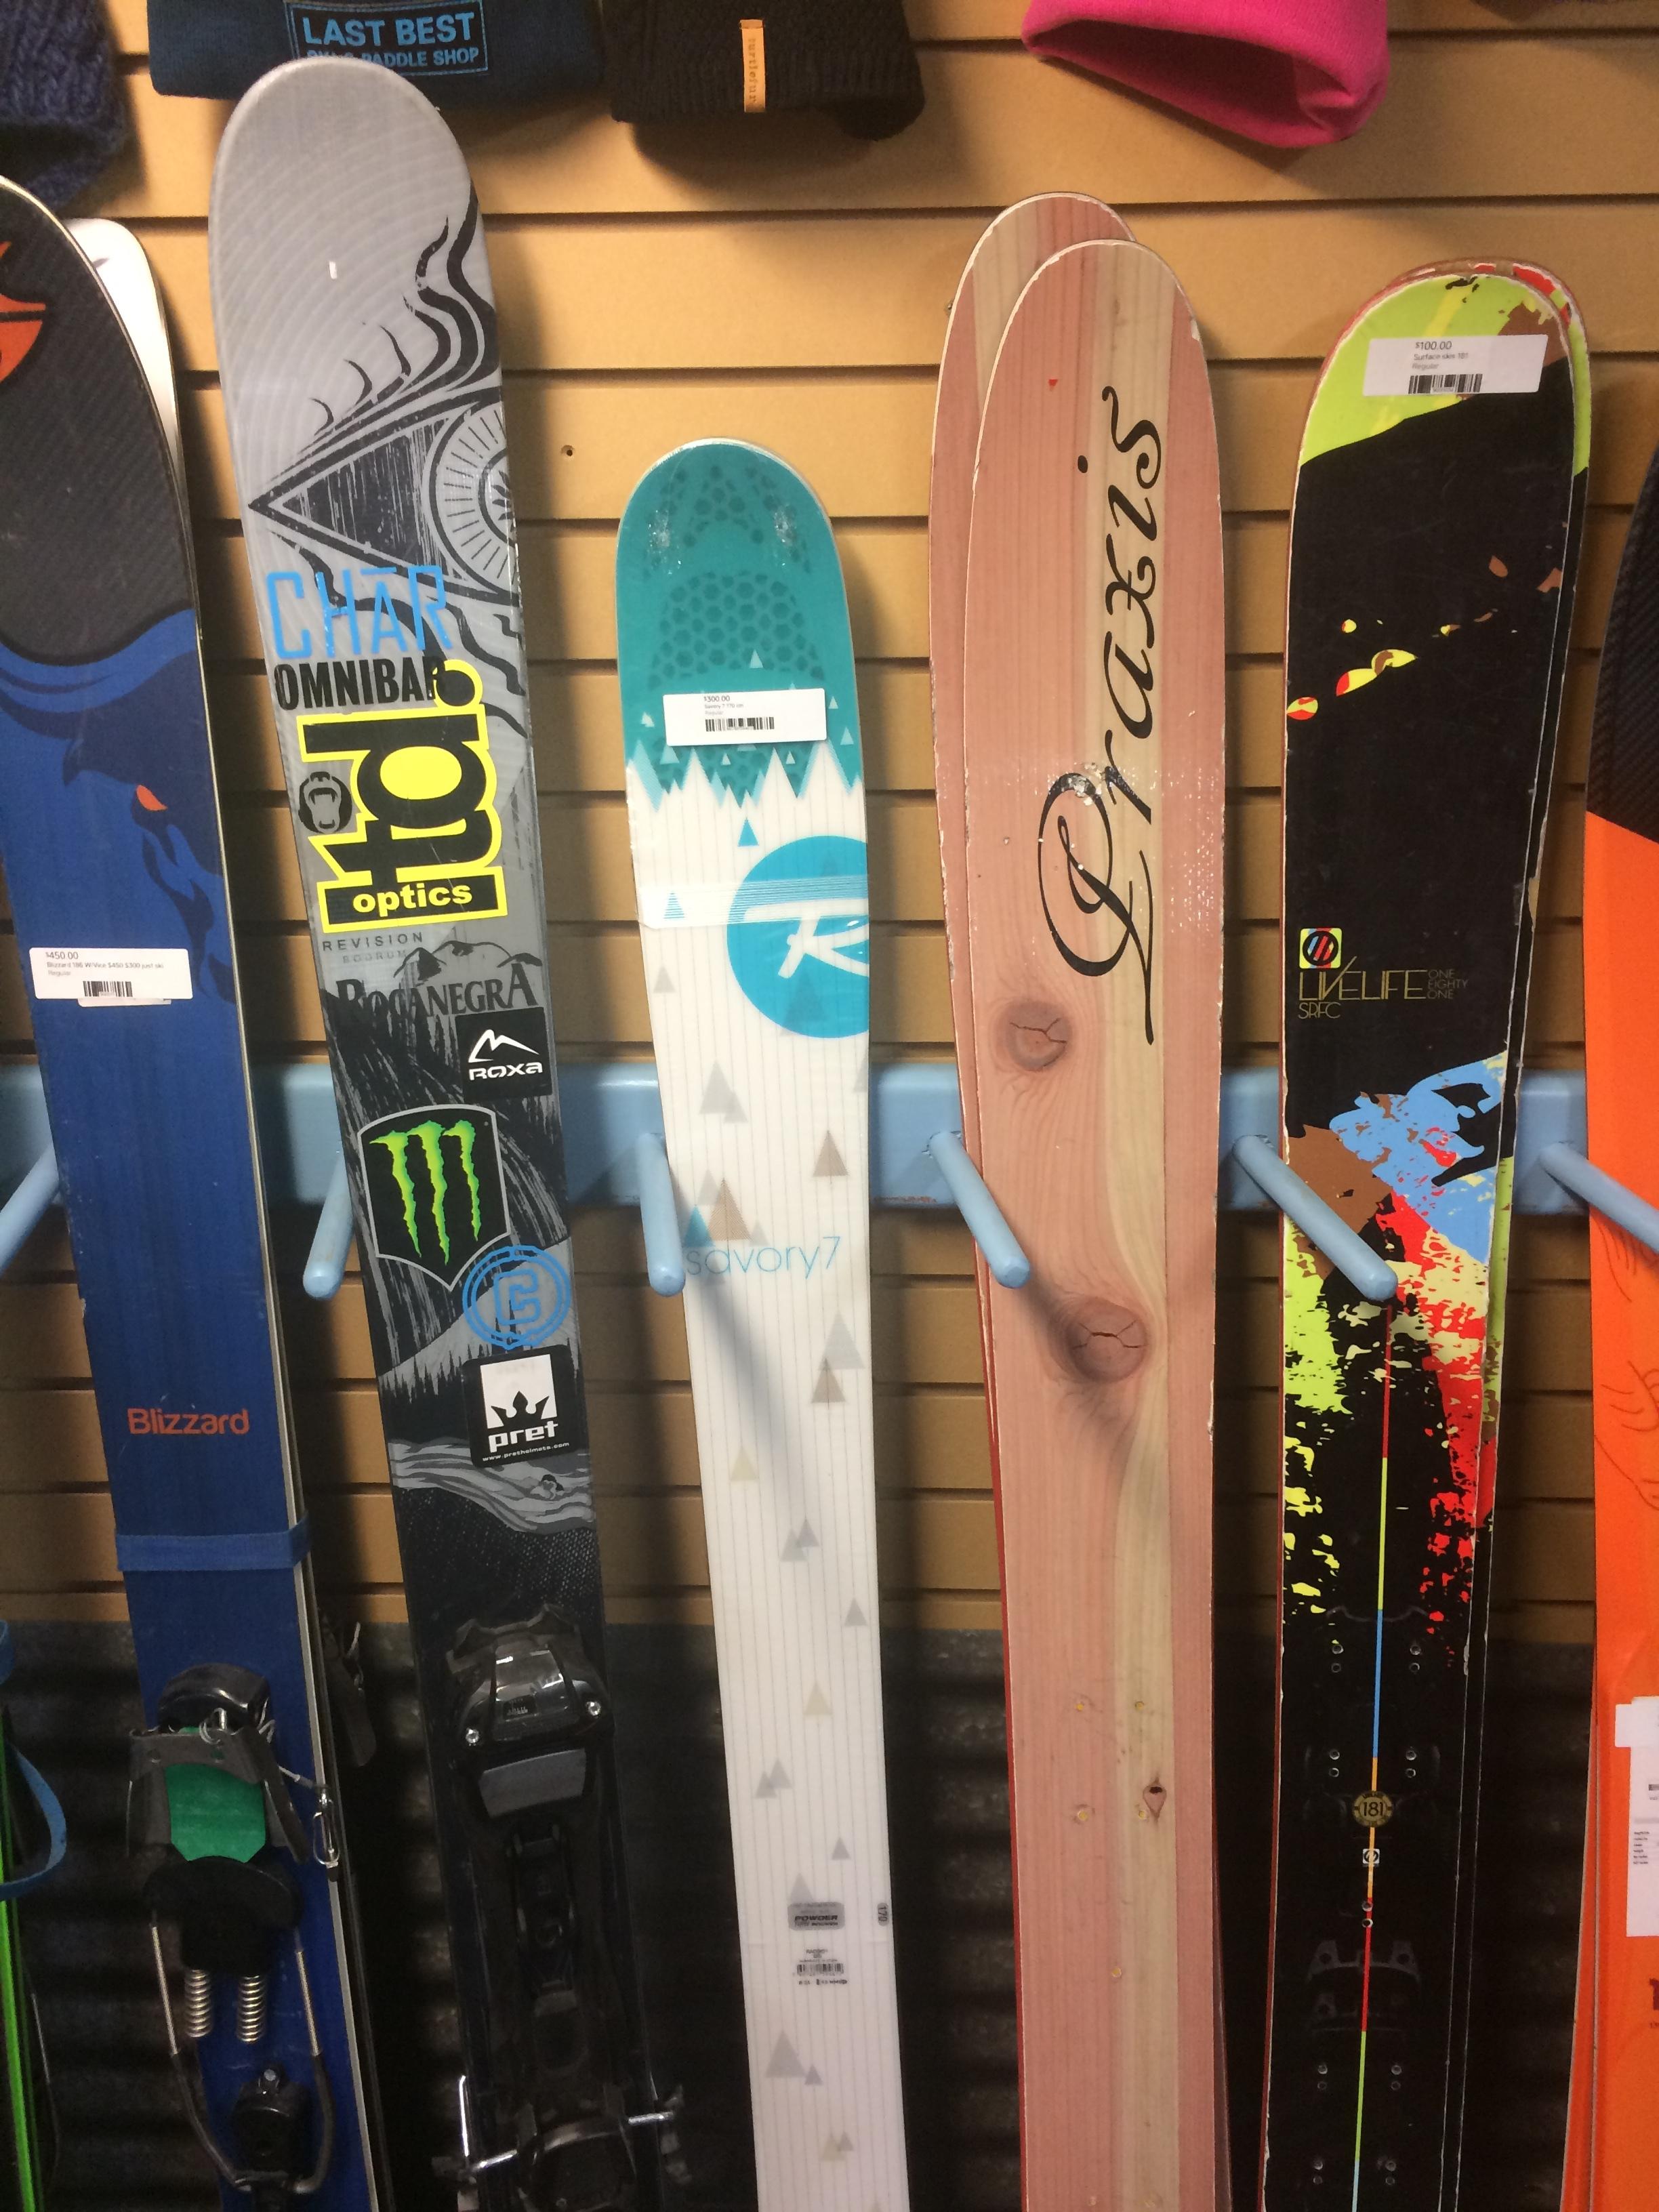 ski wall.JPG